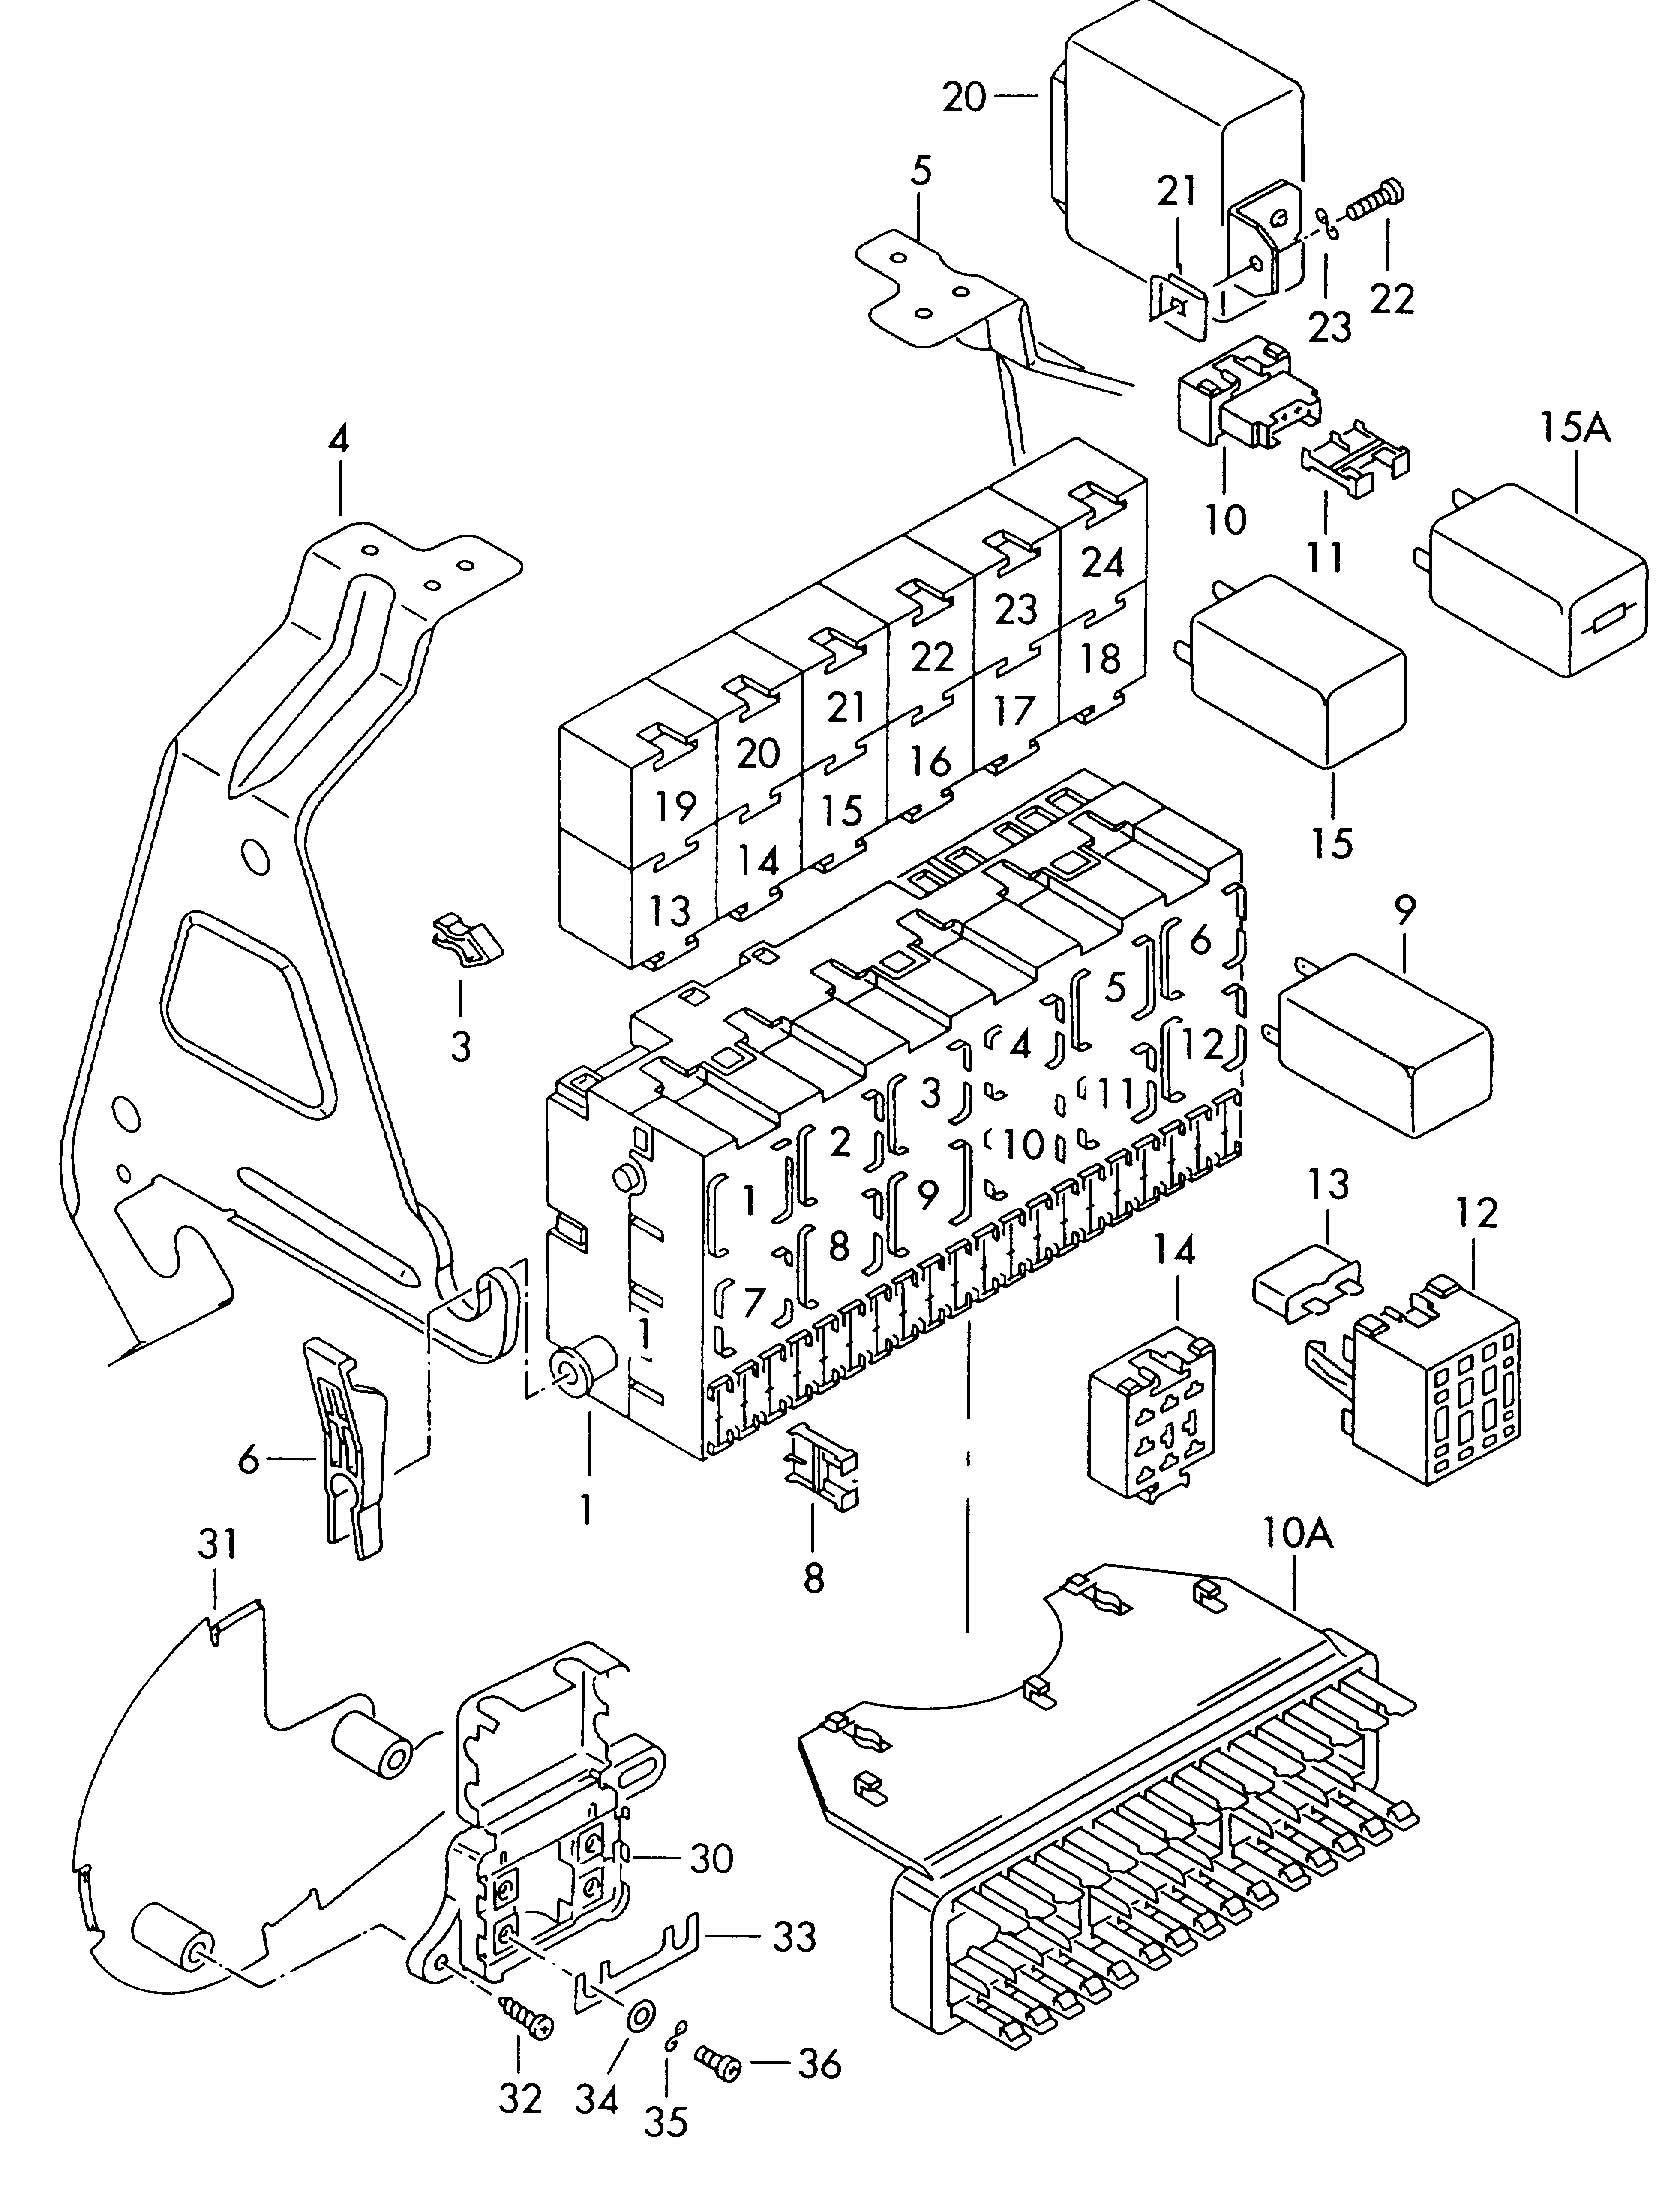 hight resolution of  wrg 1835 volkswagen eurovan fuse box